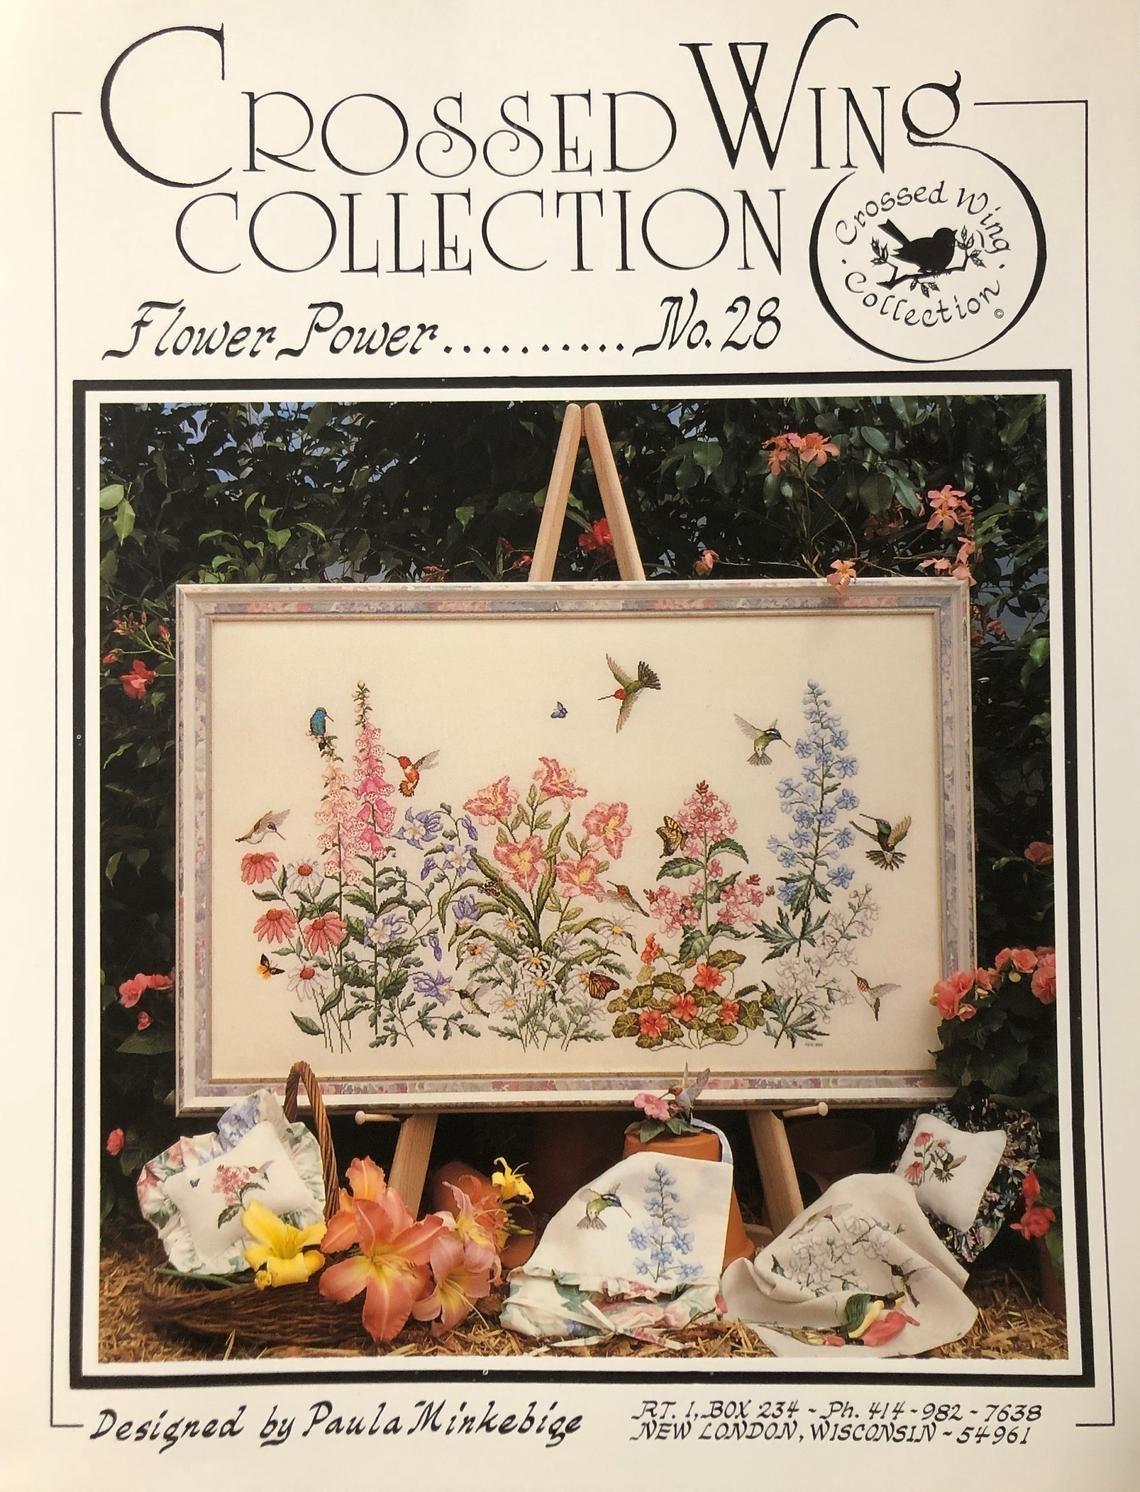 Crossed Wings Collection - Flower Power No. 28 by Paula Minkebige